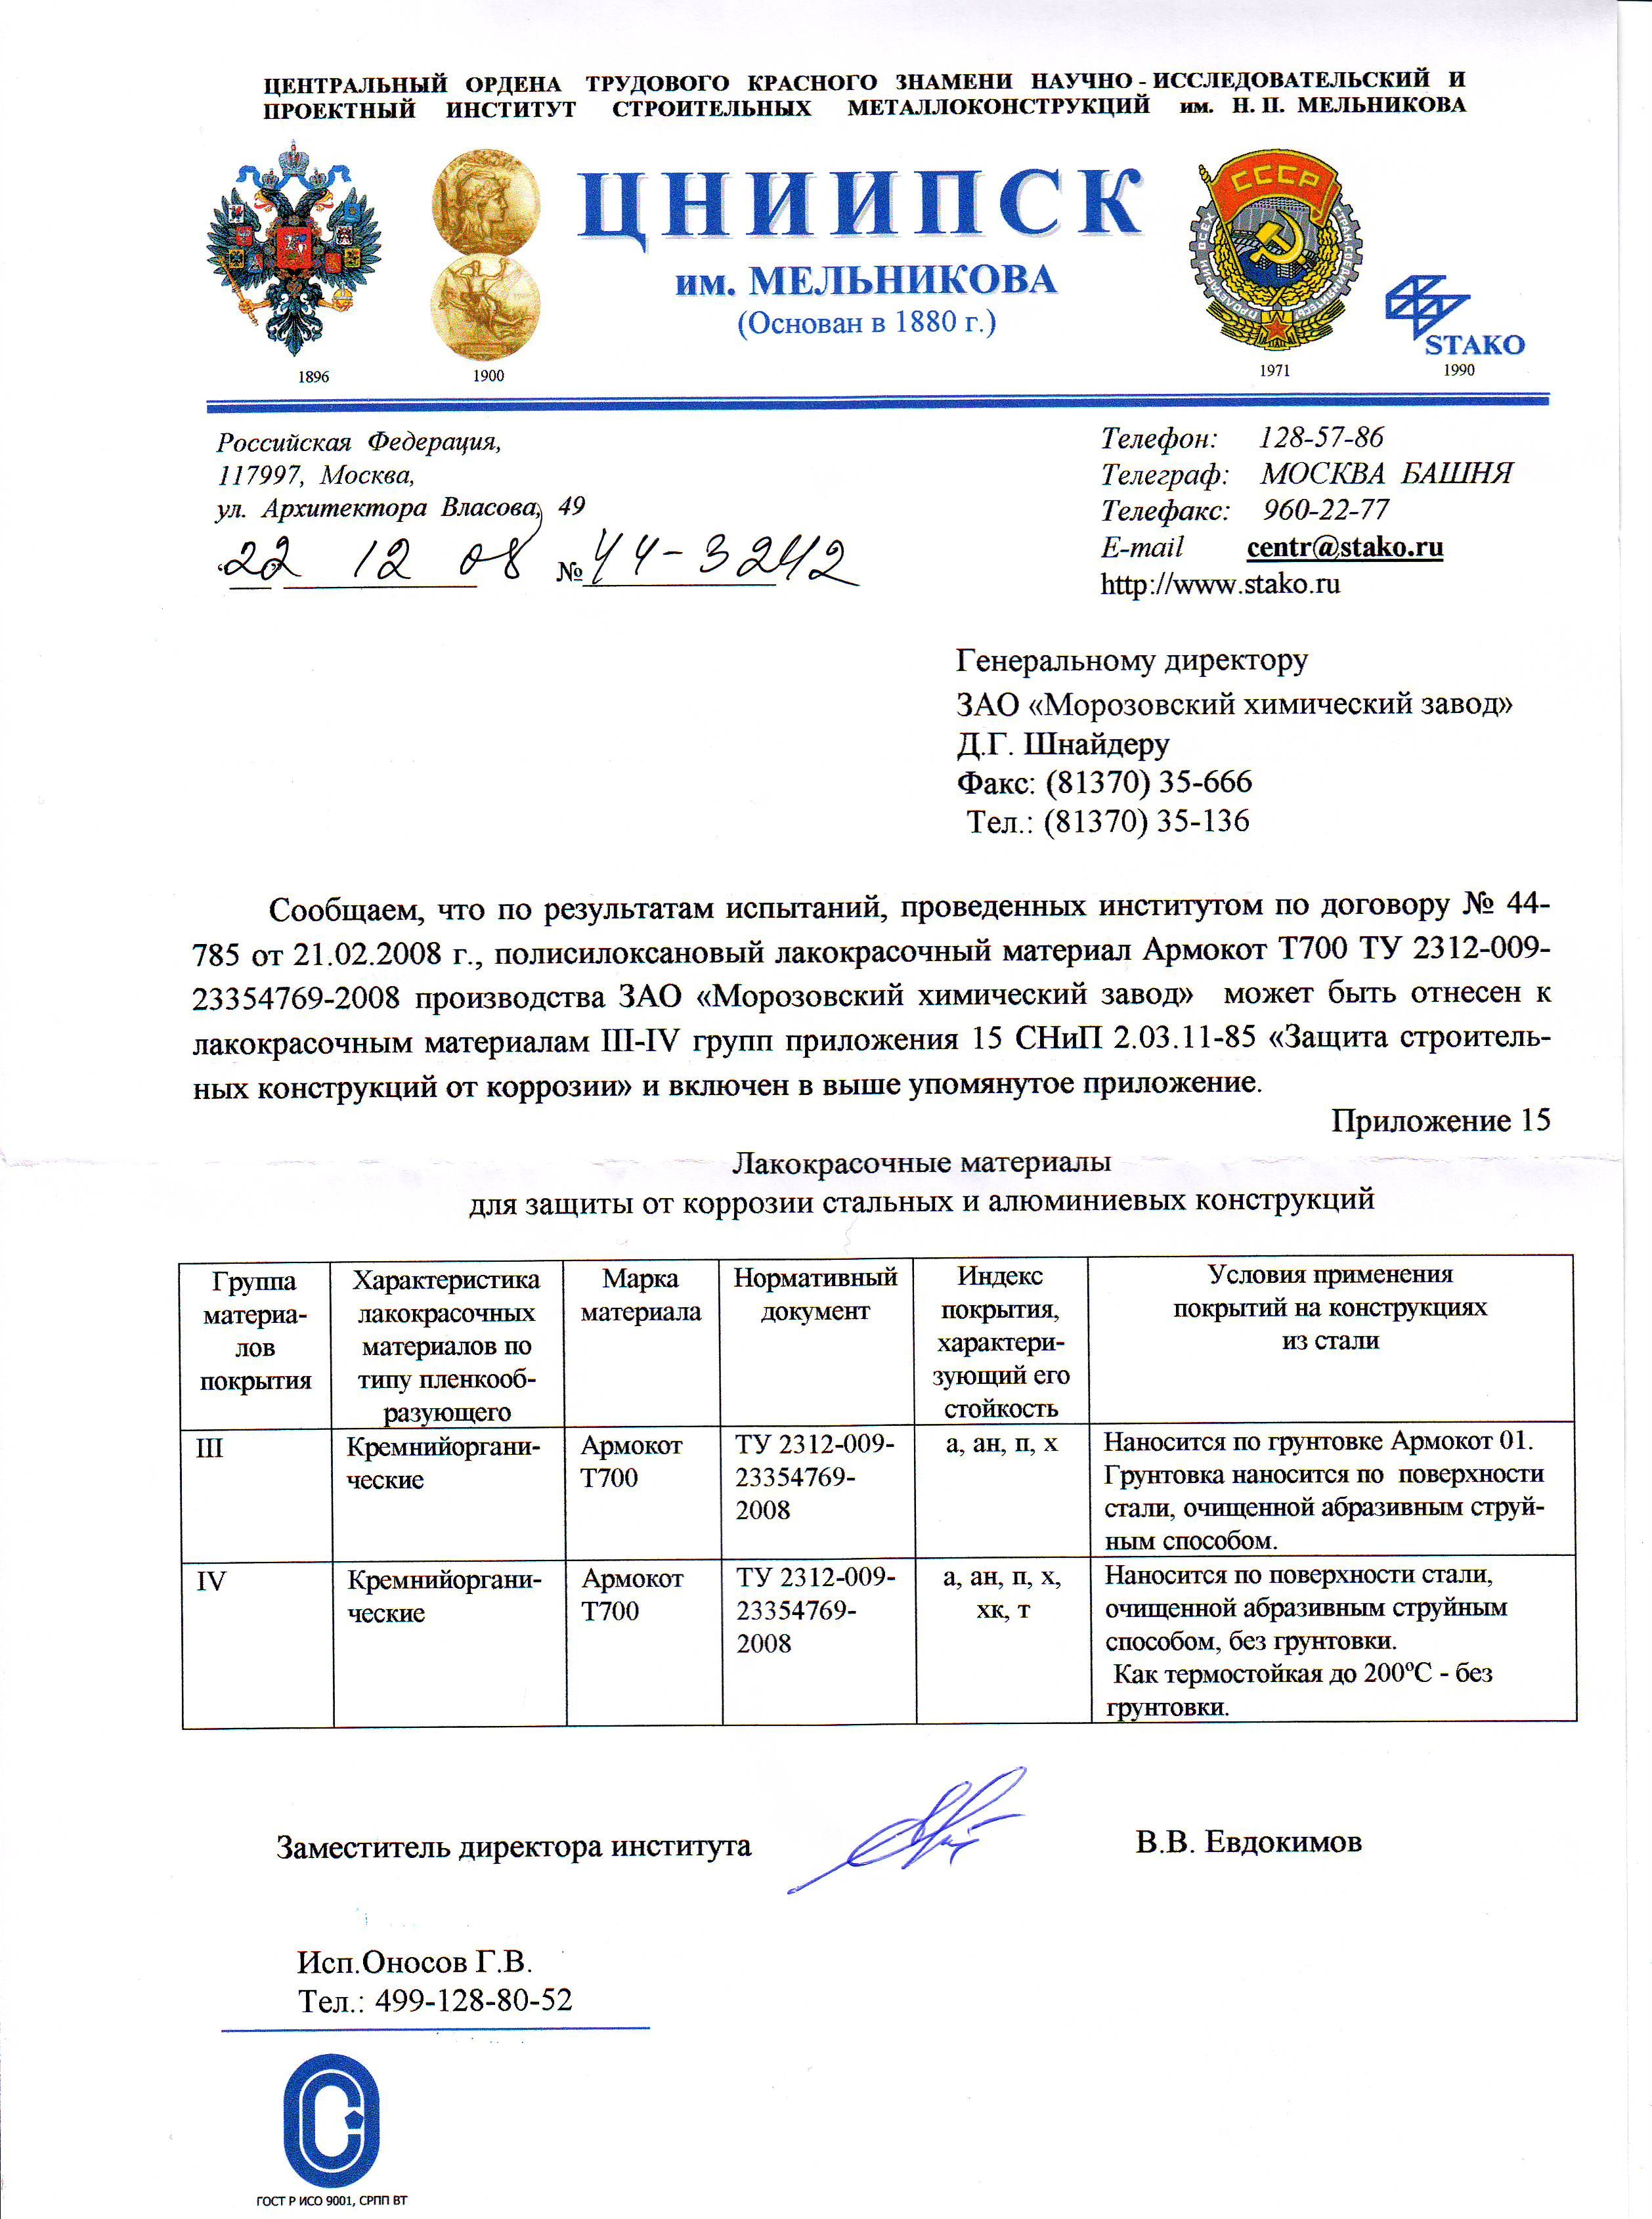 ЦНИИПСК им. Мельникова СНИП Армокот Т700